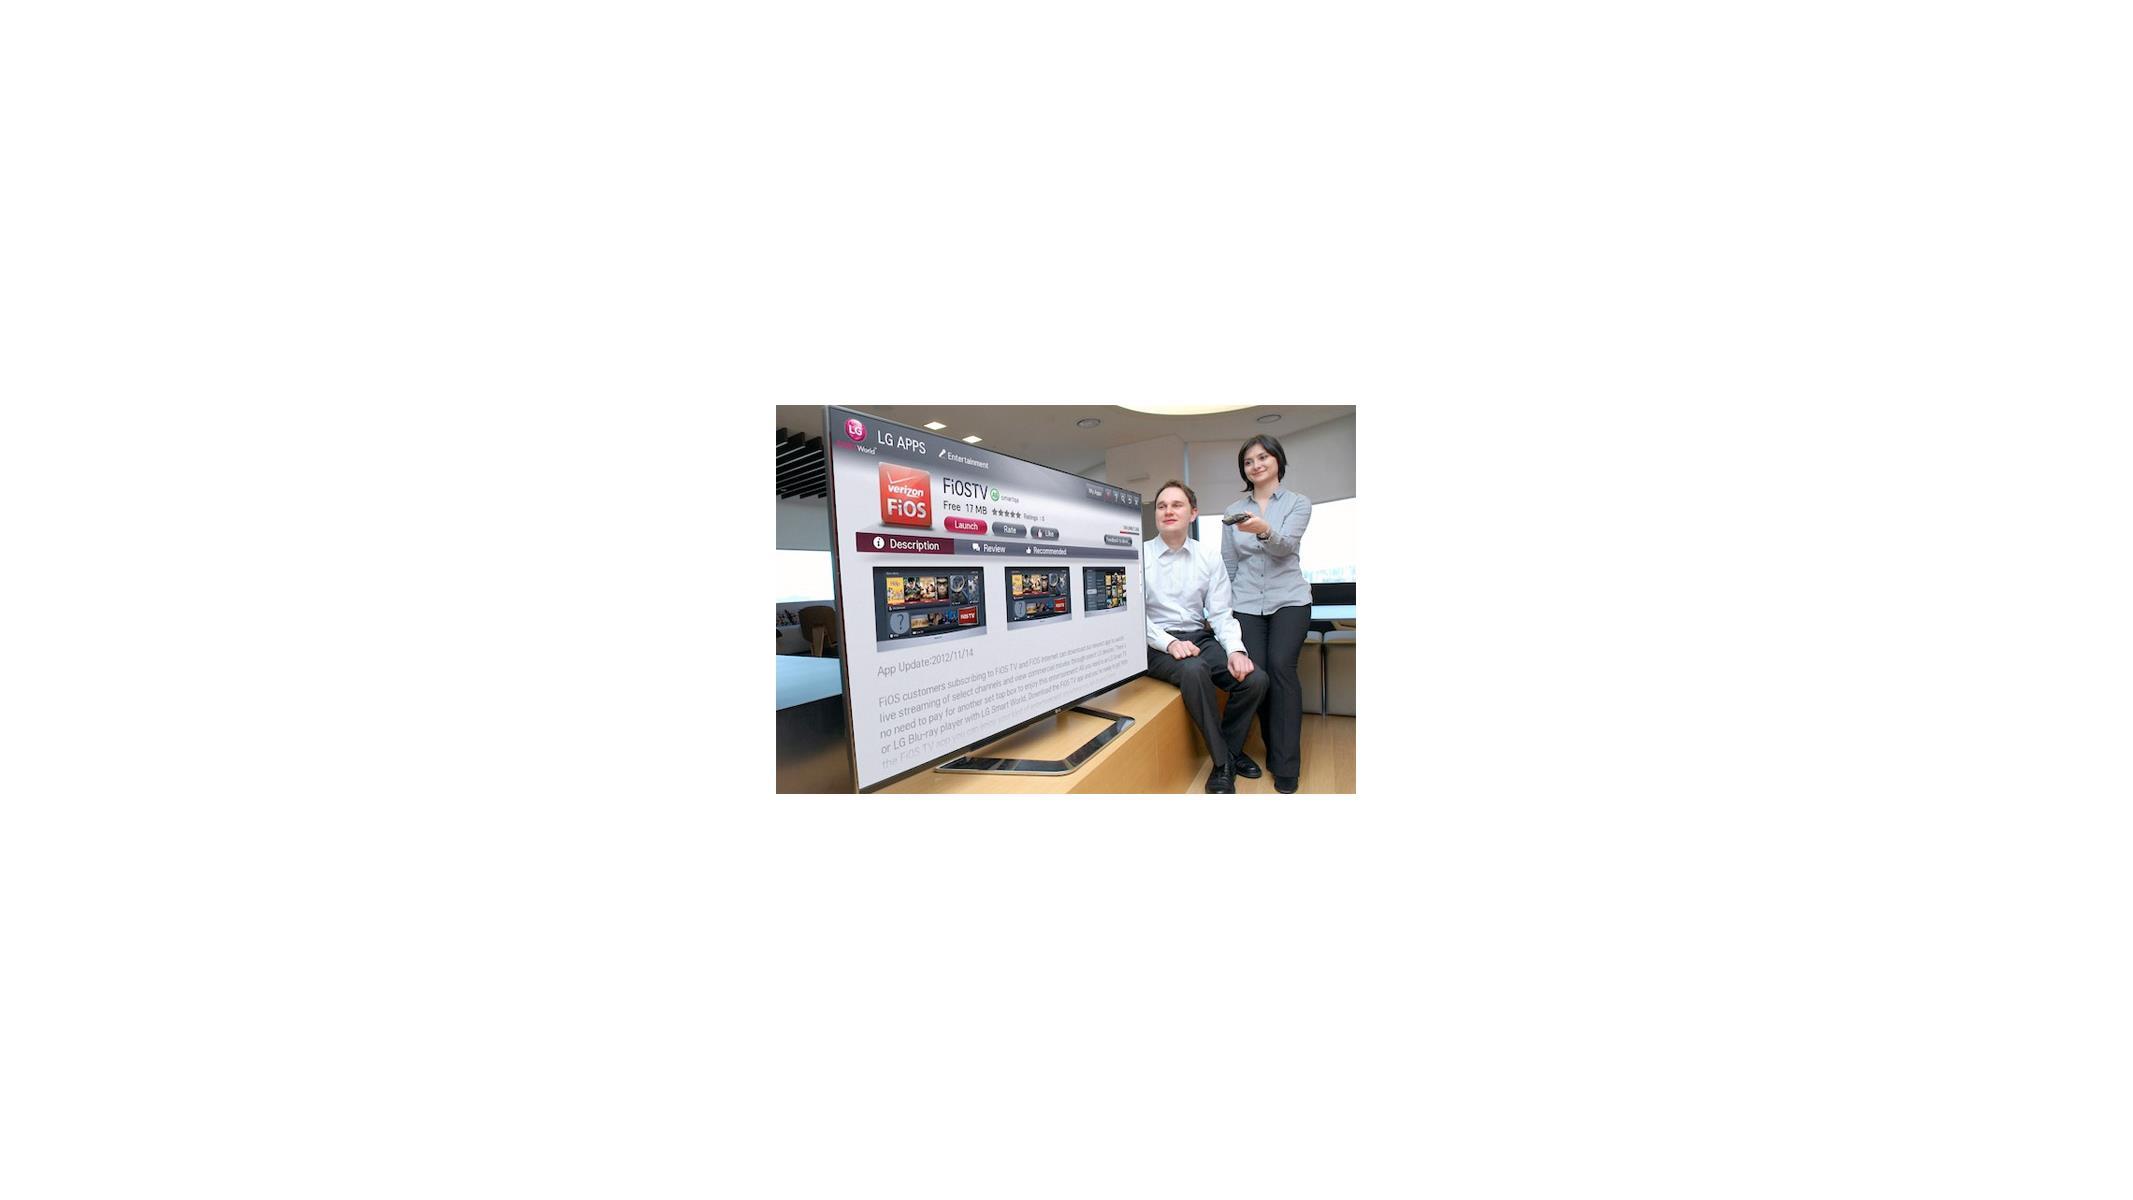 LG's Smart TV Platform Enables Direct FiOS TV Streaming